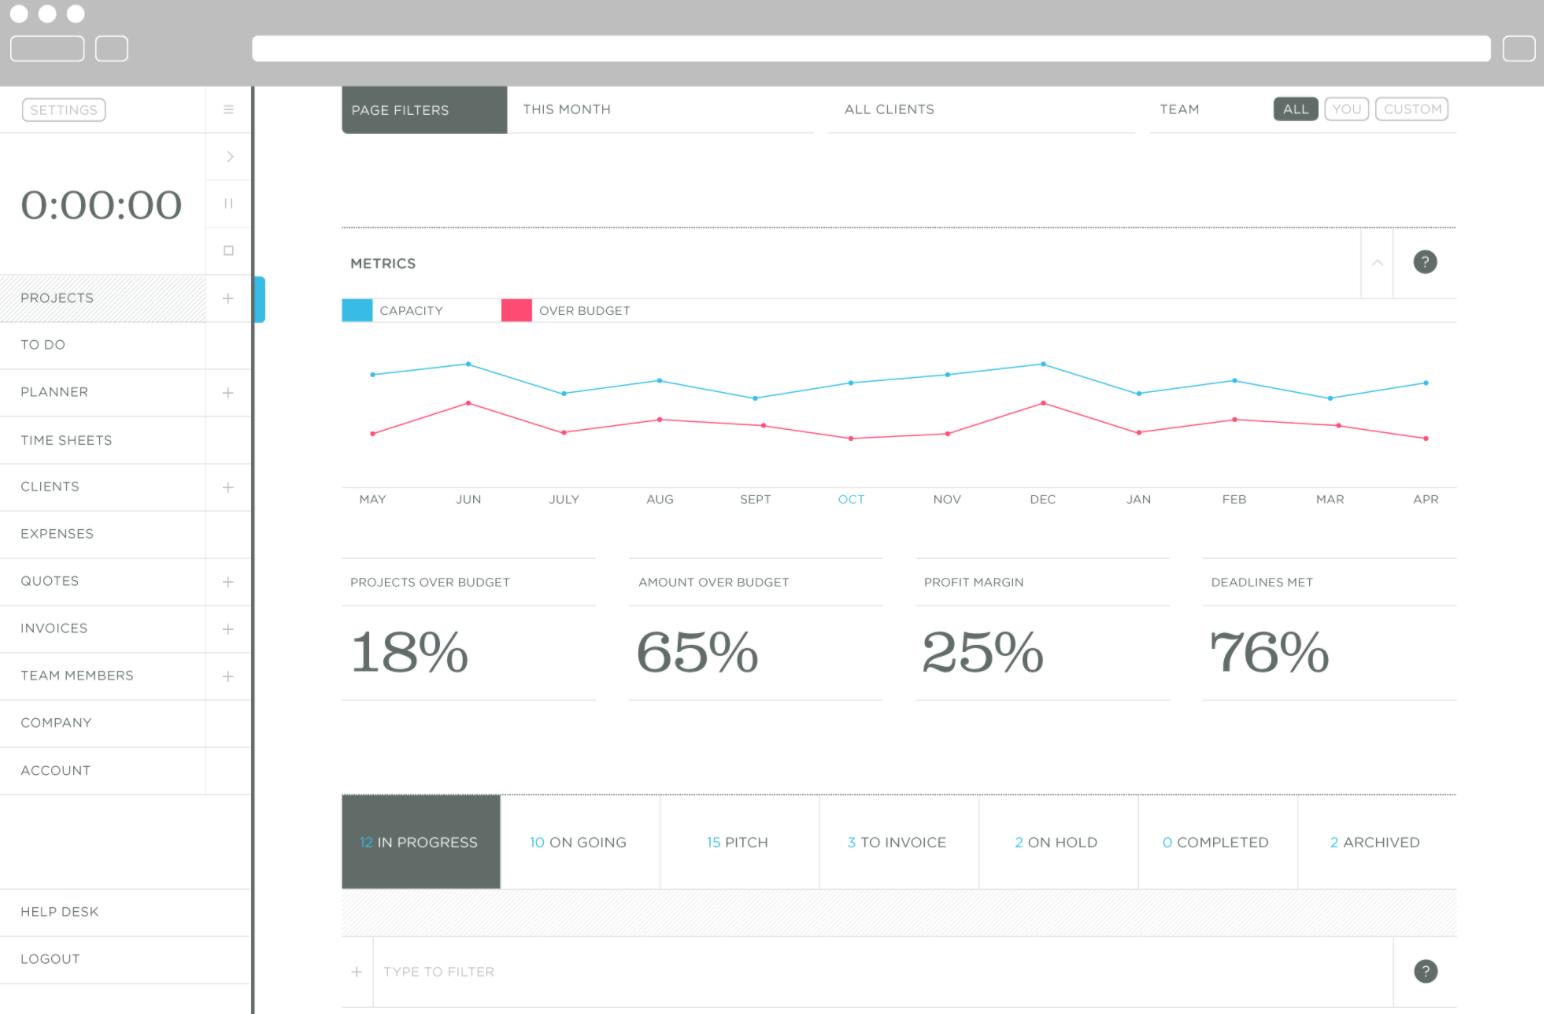 Thrive tool's dashboard